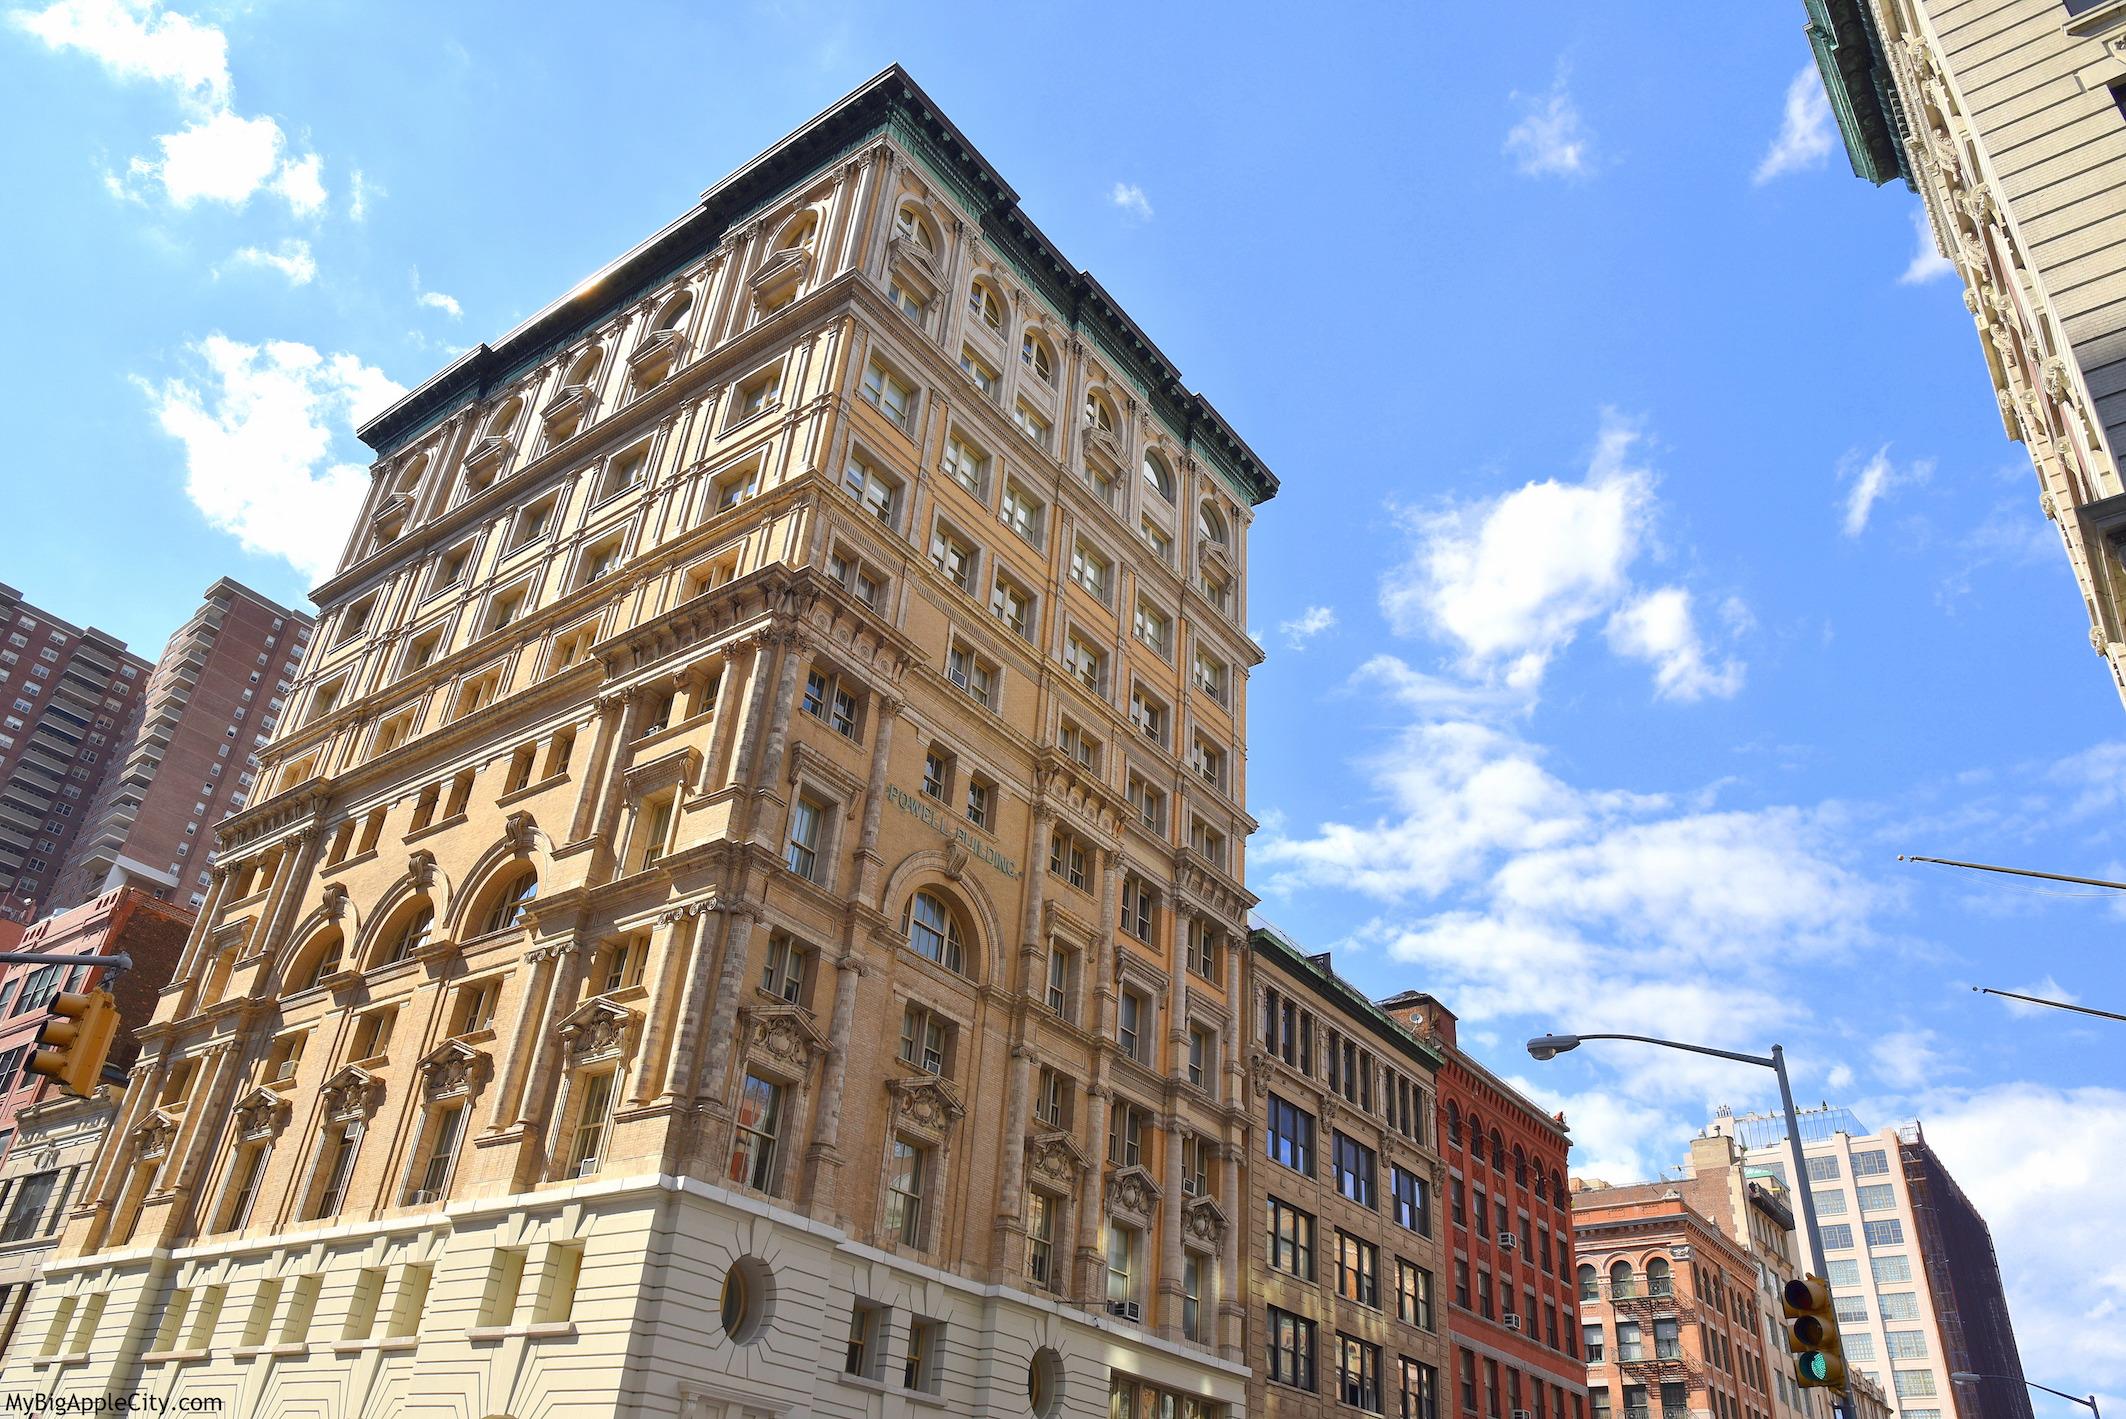 Street-photography-tribecq-walk-new-york-mybigapplecity